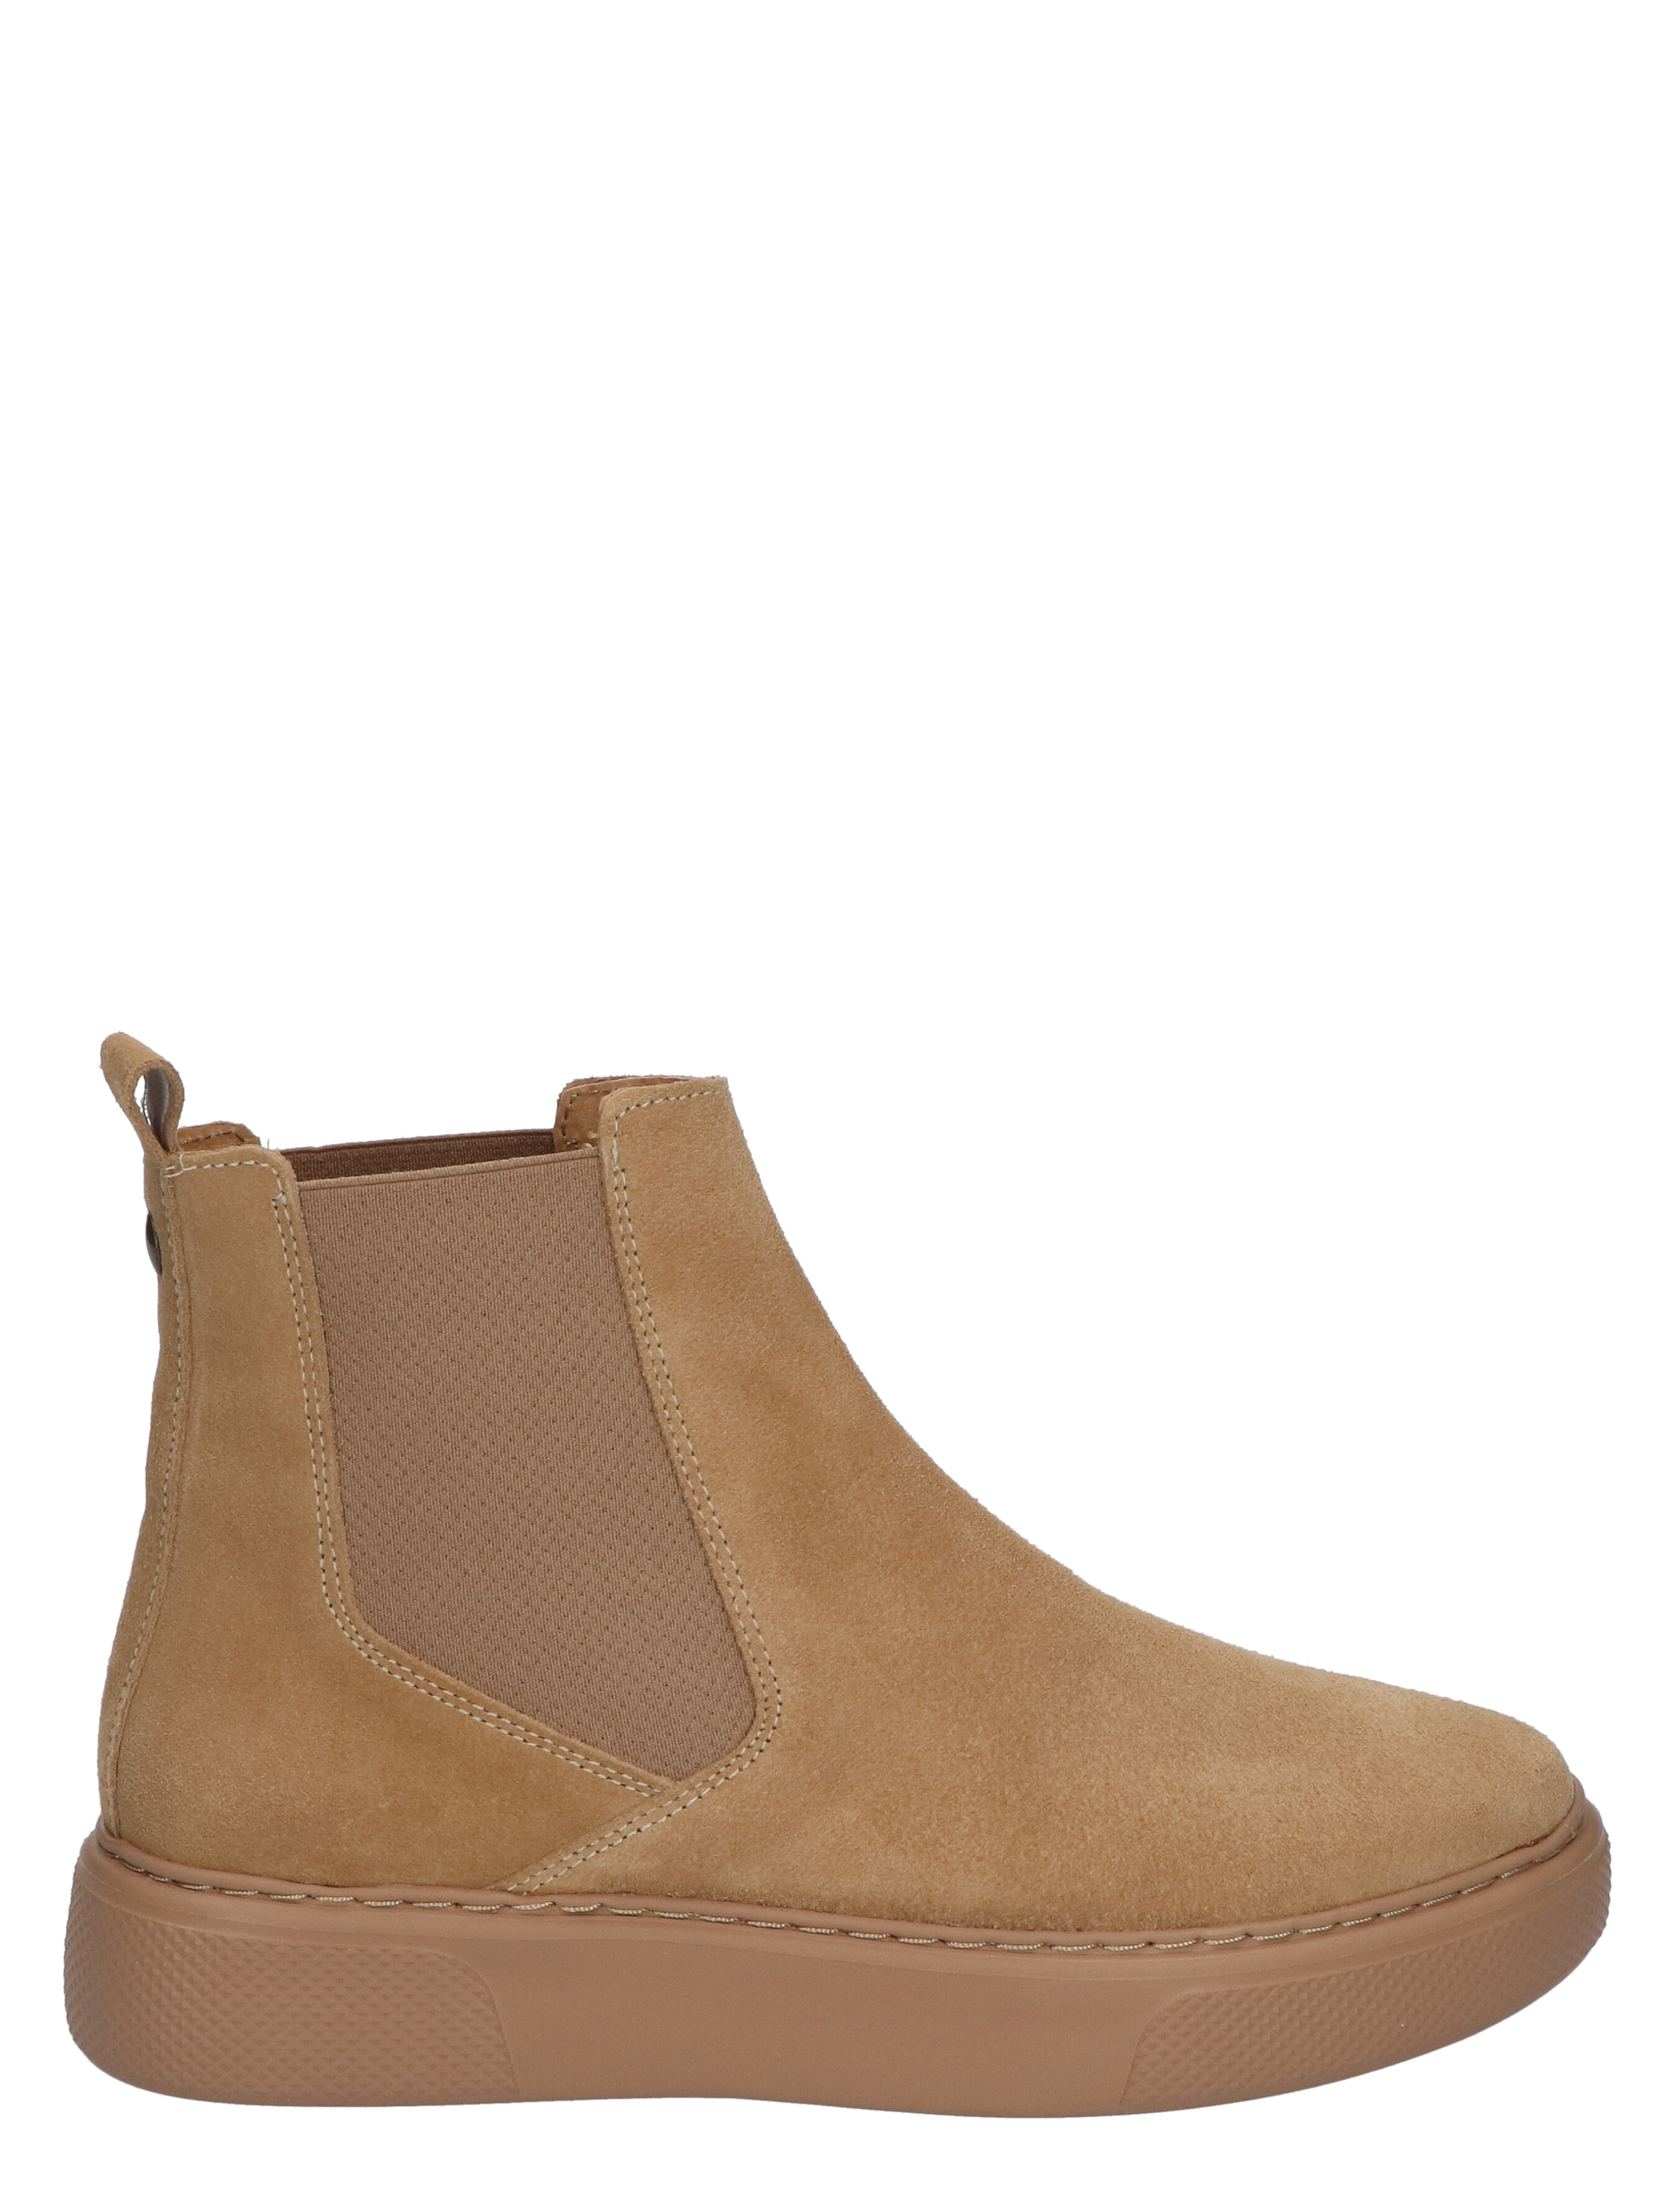 Miss Behave Alex 11 Camel Suede Chelsea boots